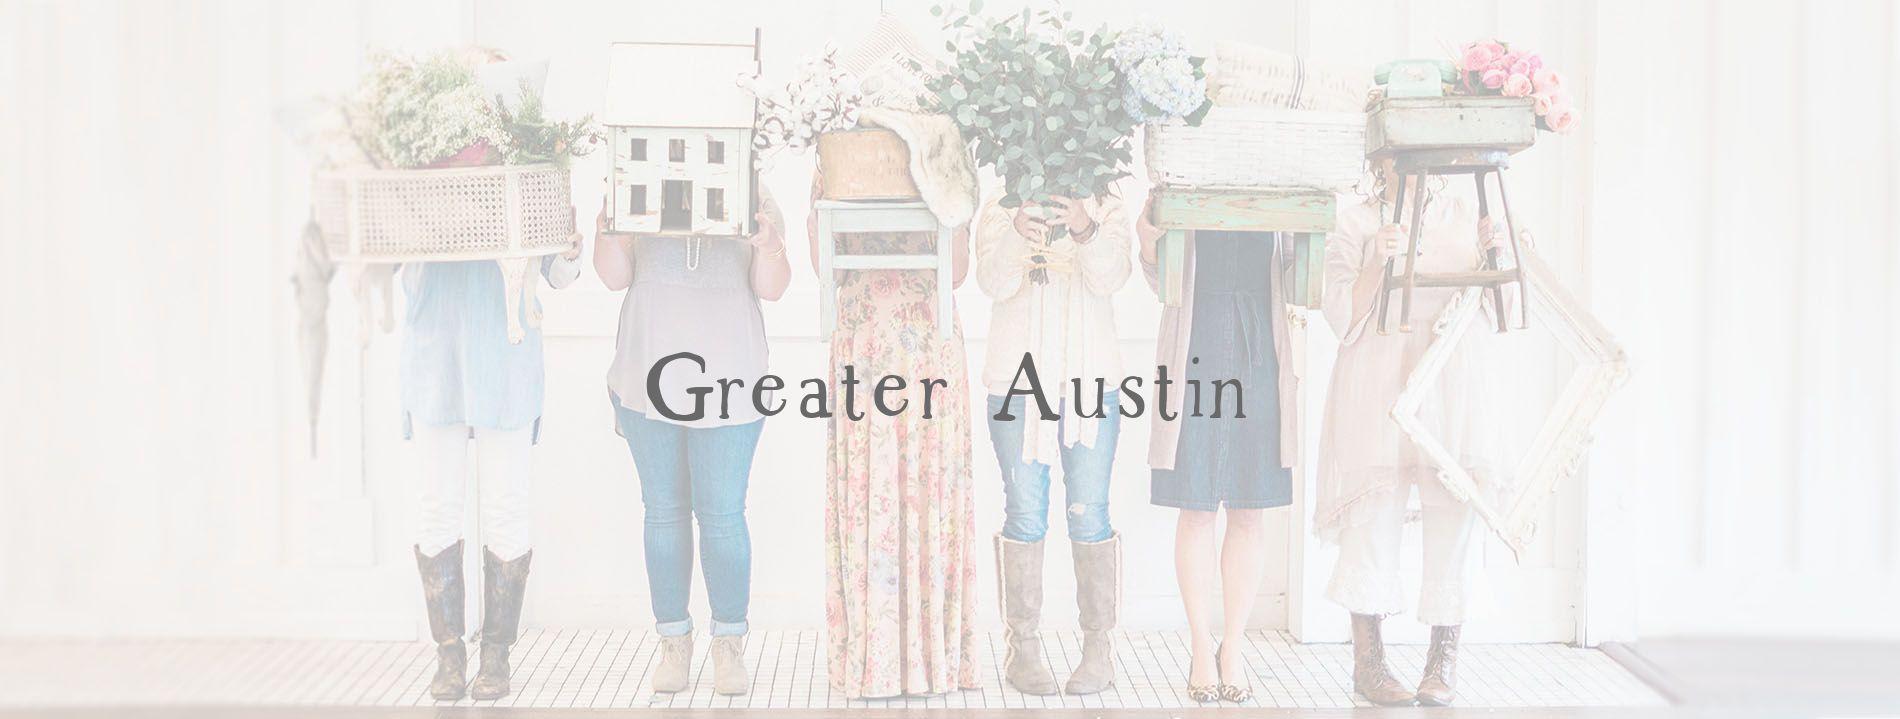 Greater Austin